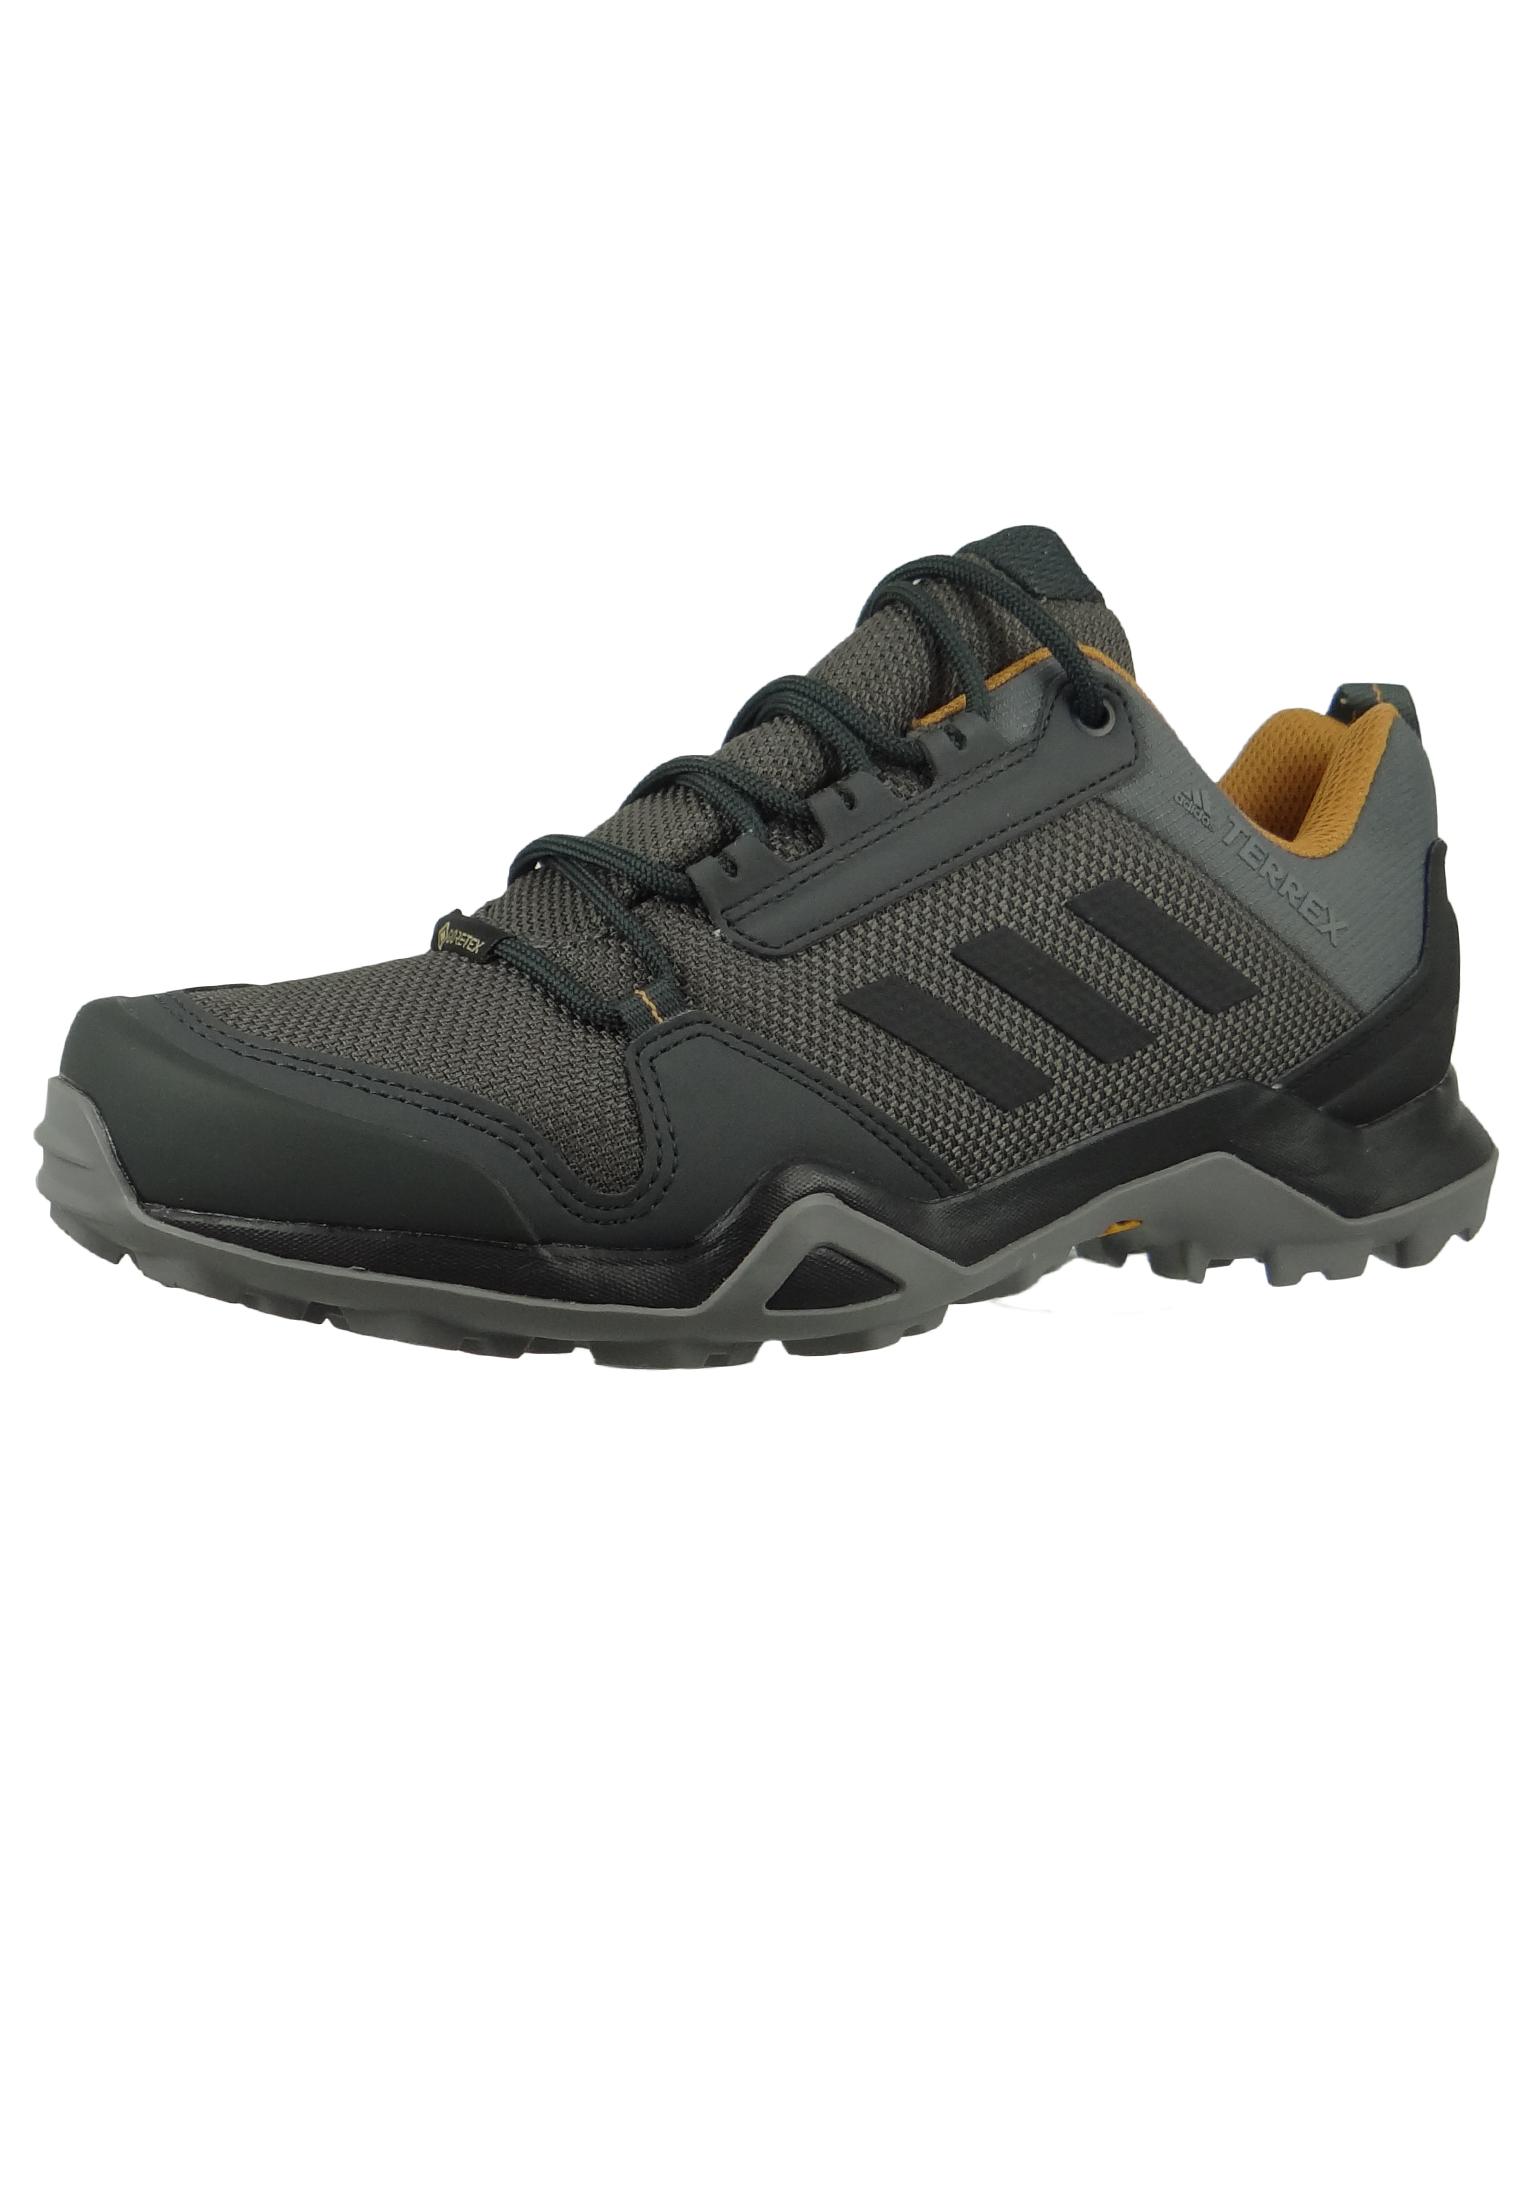 adidas TERREX AX3 GTX BC0517 Herren Hiking Outdoorschuhe grey fivecore blackmesa Grau